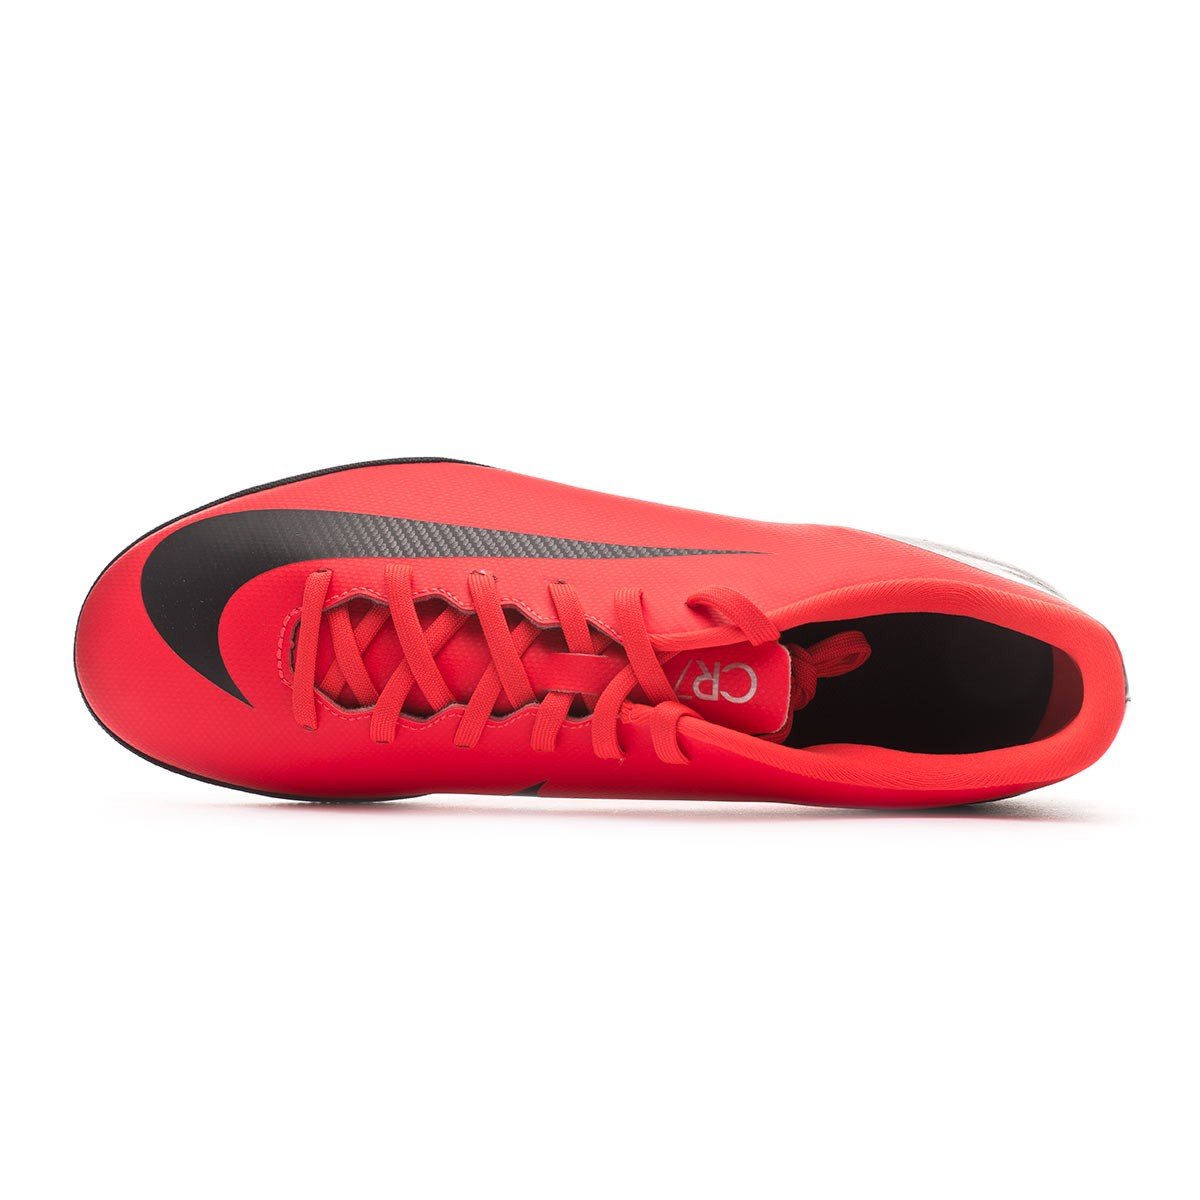 153182f11 Sapatilha de Futsal Nike Mercurial VaporX XII Club CR7 IC Bright crimson- Black-Chrome - Loja de futebol Fútbol Emotion